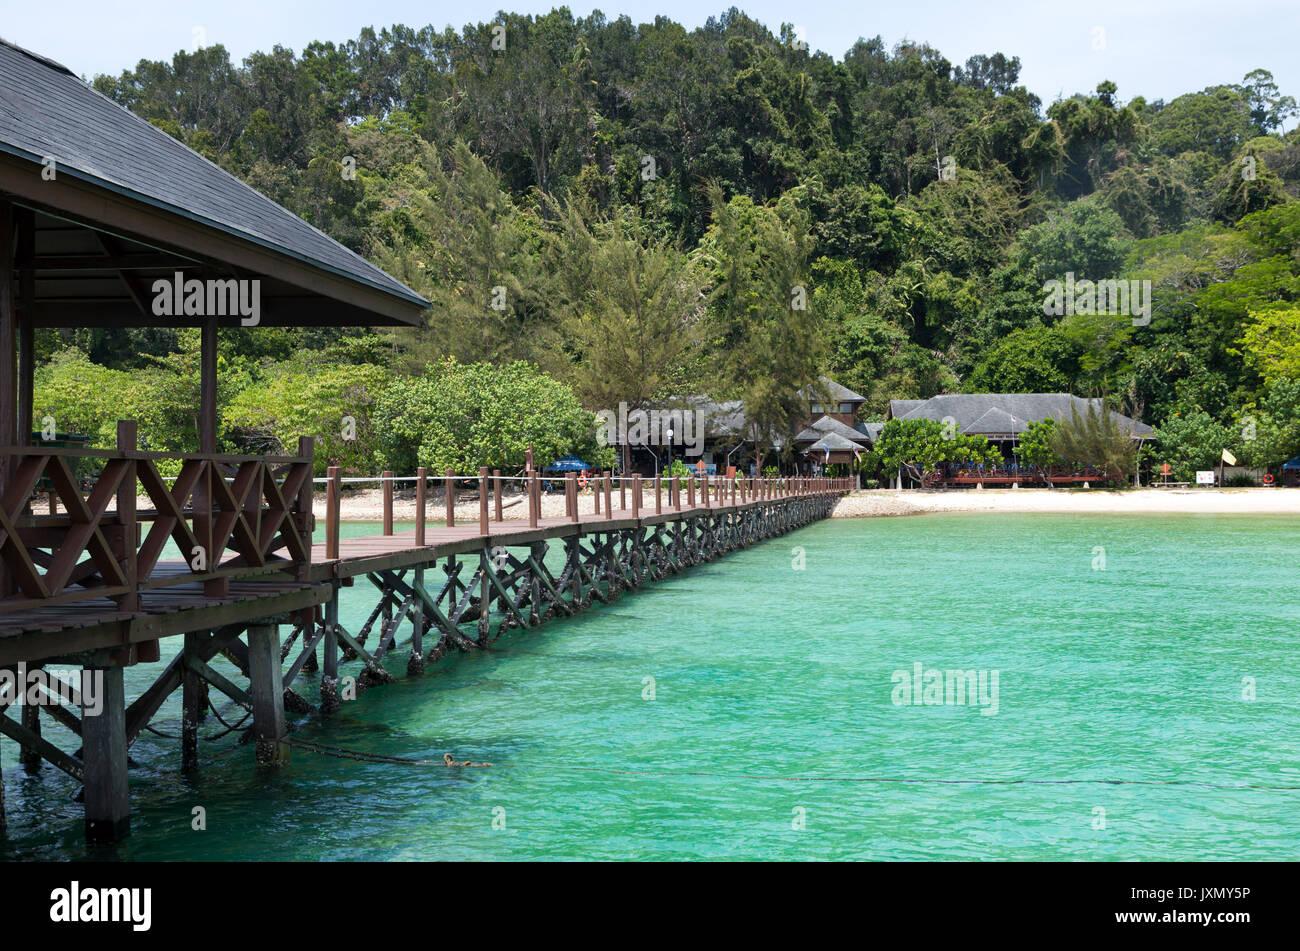 Jetty On Pulau Gaya, Tunku Abdul Rahman National Park, Kota Kinabalu, Sabah, Malaysia - Stock Image